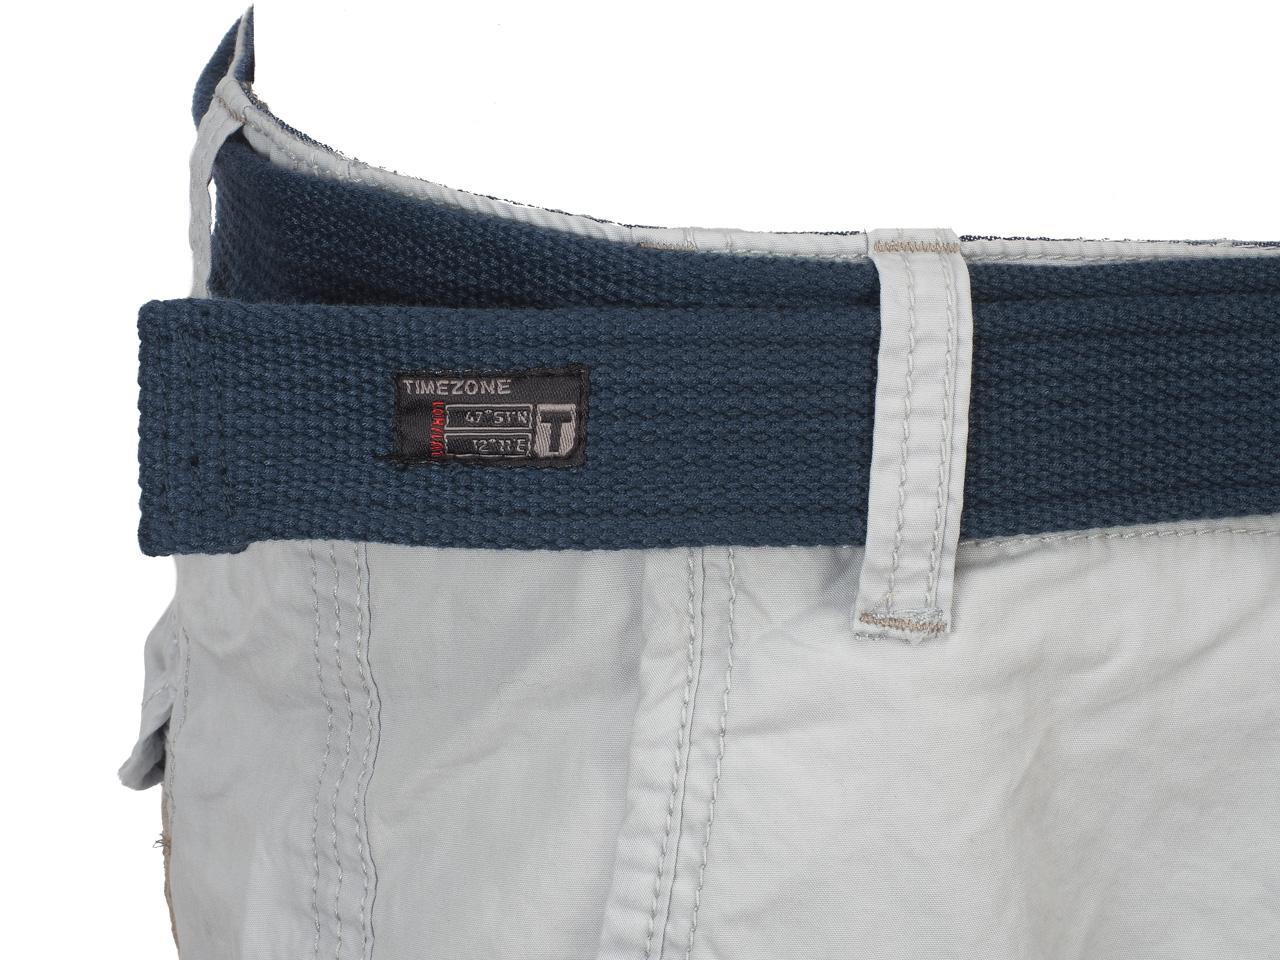 Bermuda-Shorts-Timezone-Russell-Light-Grey-Shorts-Grey-42181-New thumbnail 3